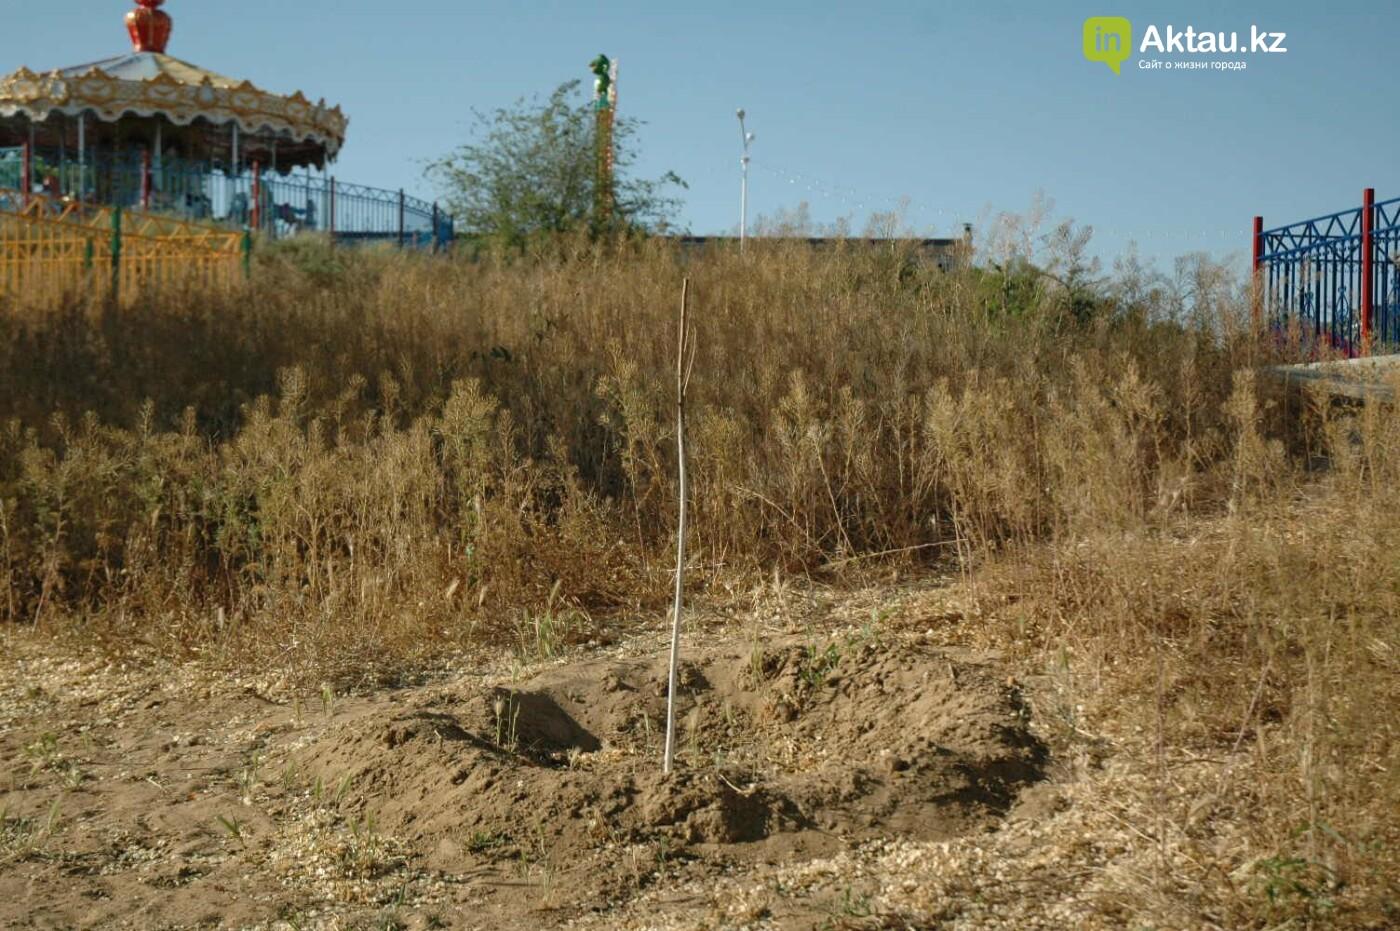 Погибшие от засухи и обезвоживания в Актау исчисляются десятками (ФОТО), фото-45